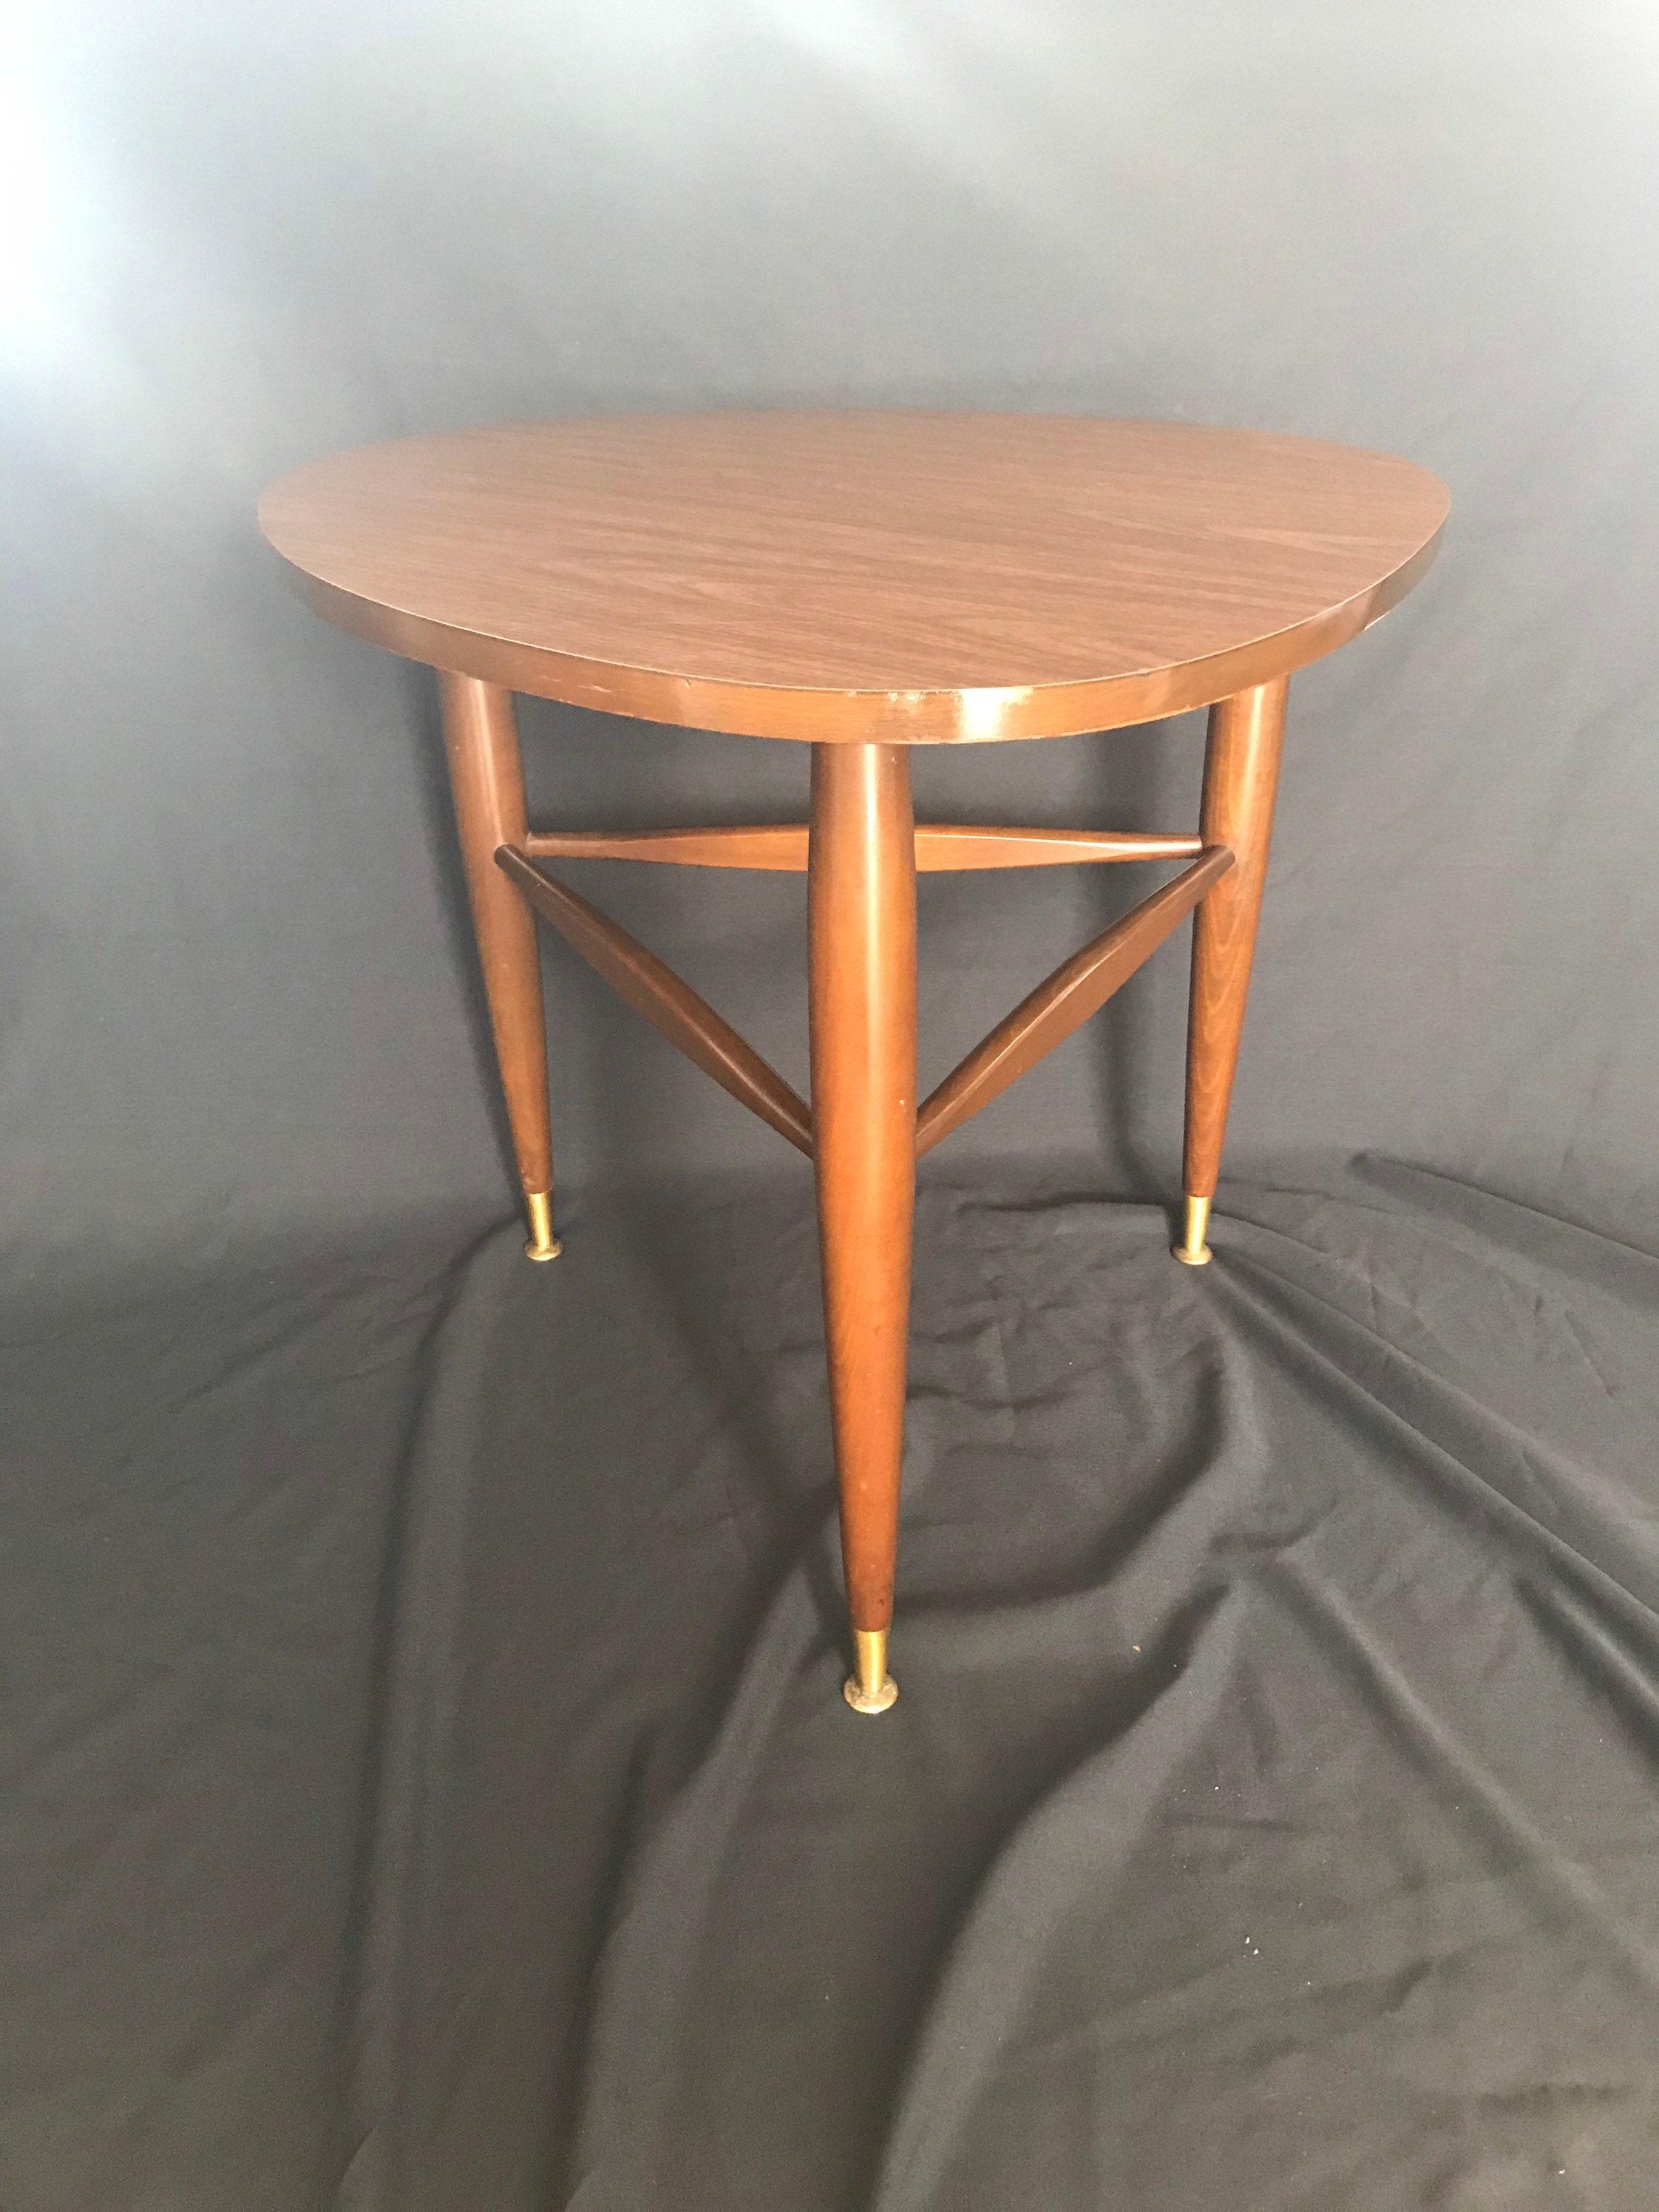 Image of: Mersman Guitar Pick Table Mid Century Modern Tripod End Table Vintage Mersman 1960s